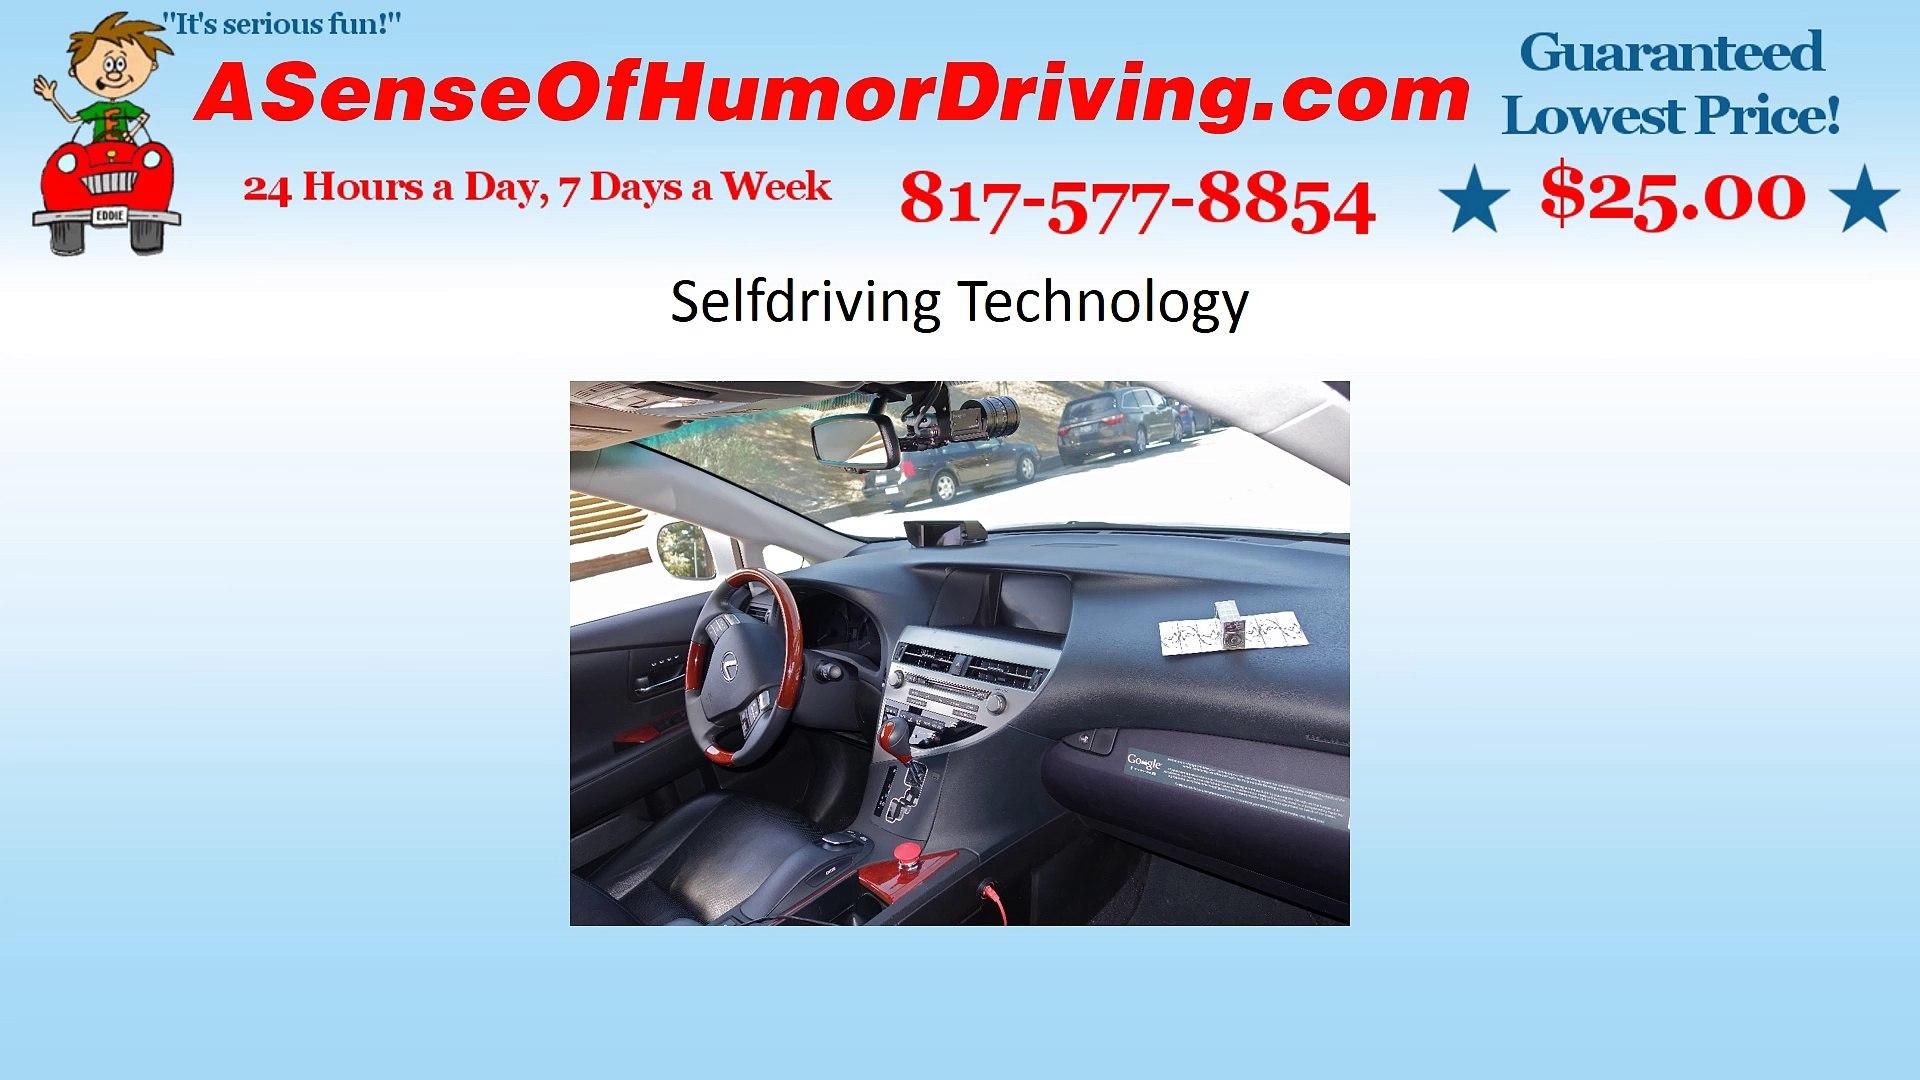 Selfdriving Technology